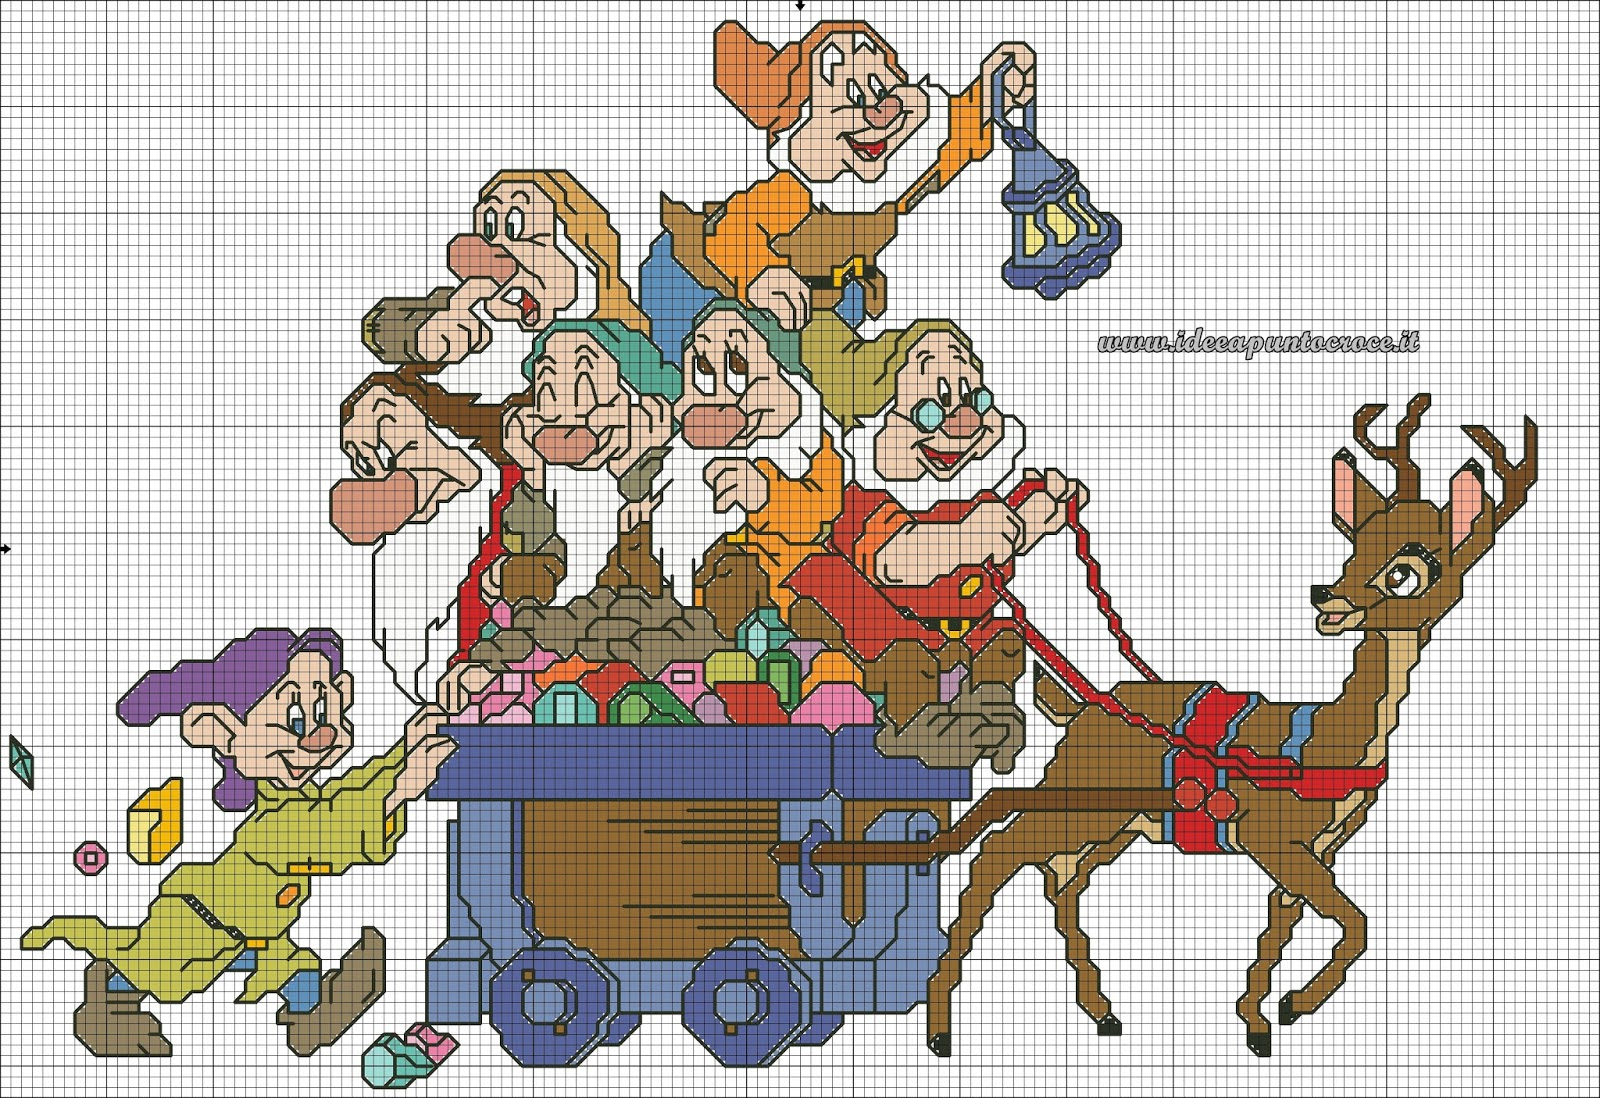 Schemi punto croce da stampare gratis jv96 regardsdefemmes for Copertine punto croce bimbi schemi